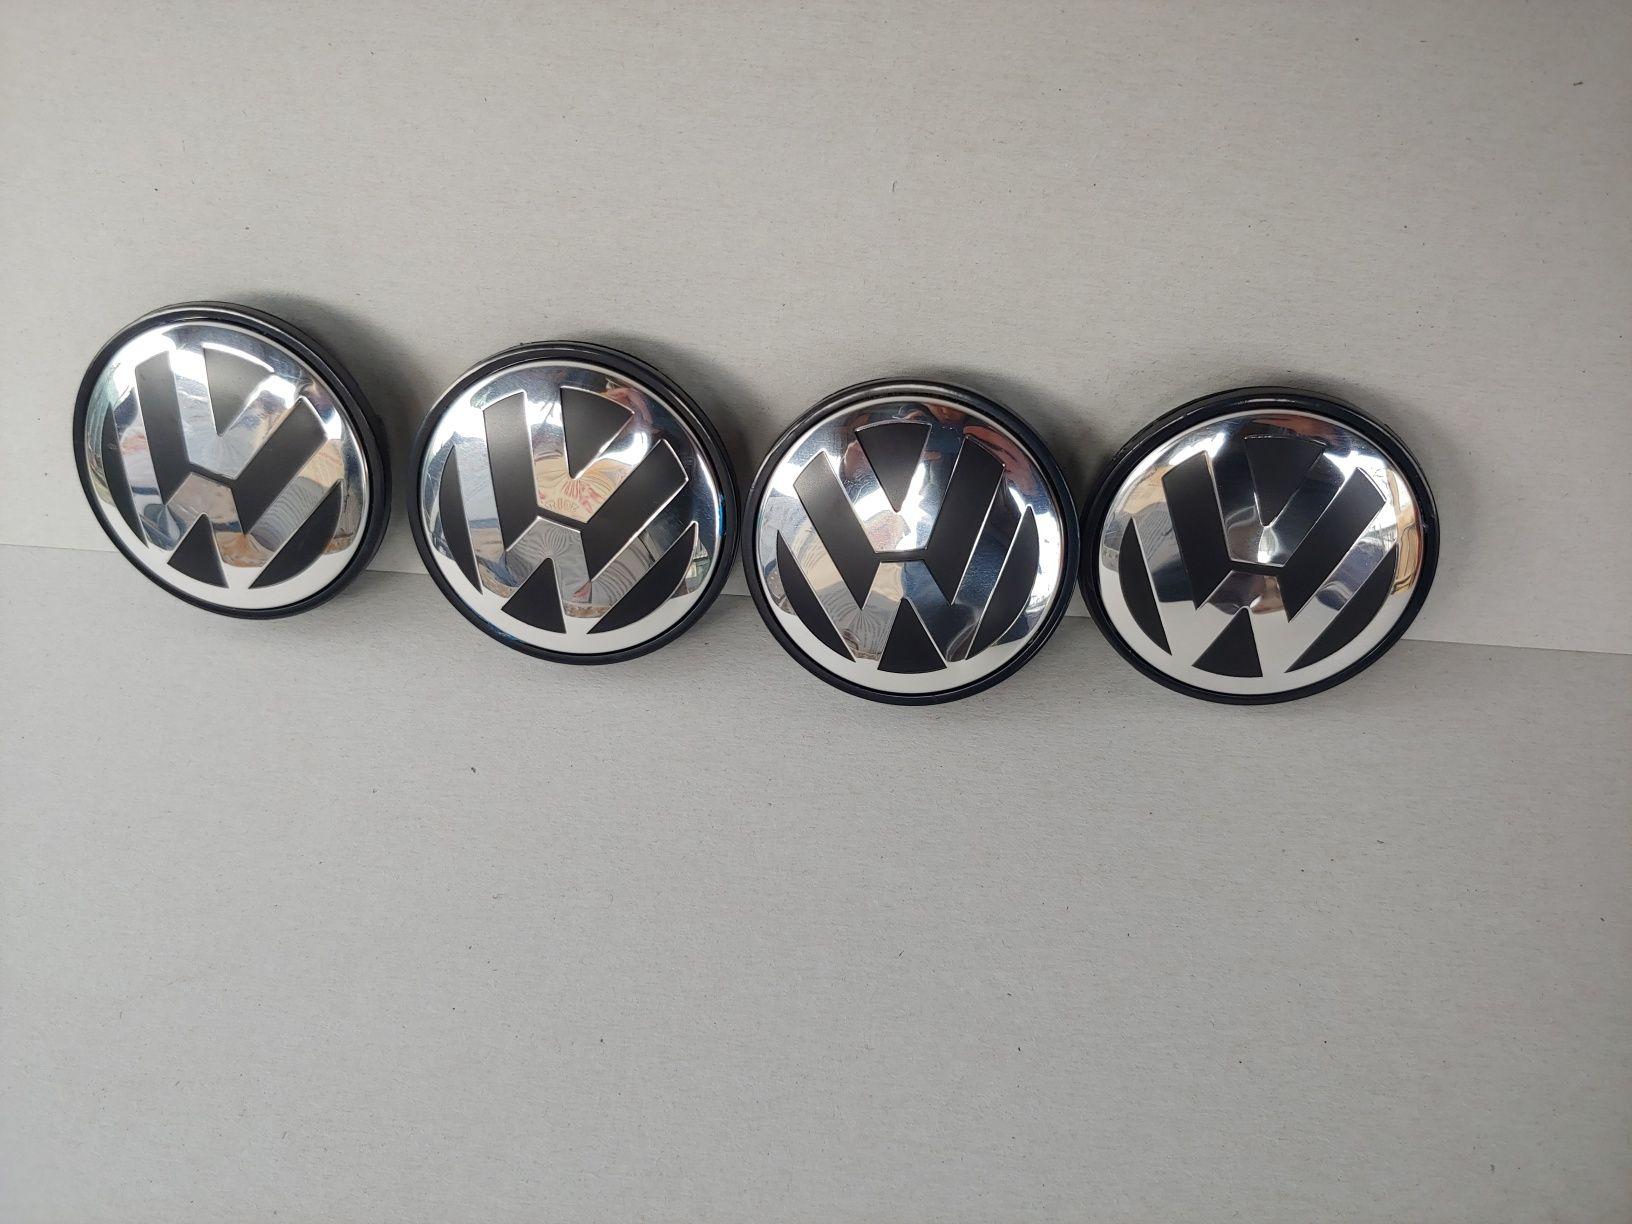 76мм Капачки за джанти за VW Фолксваген Туарег 2004-10г. 7L6 601 149